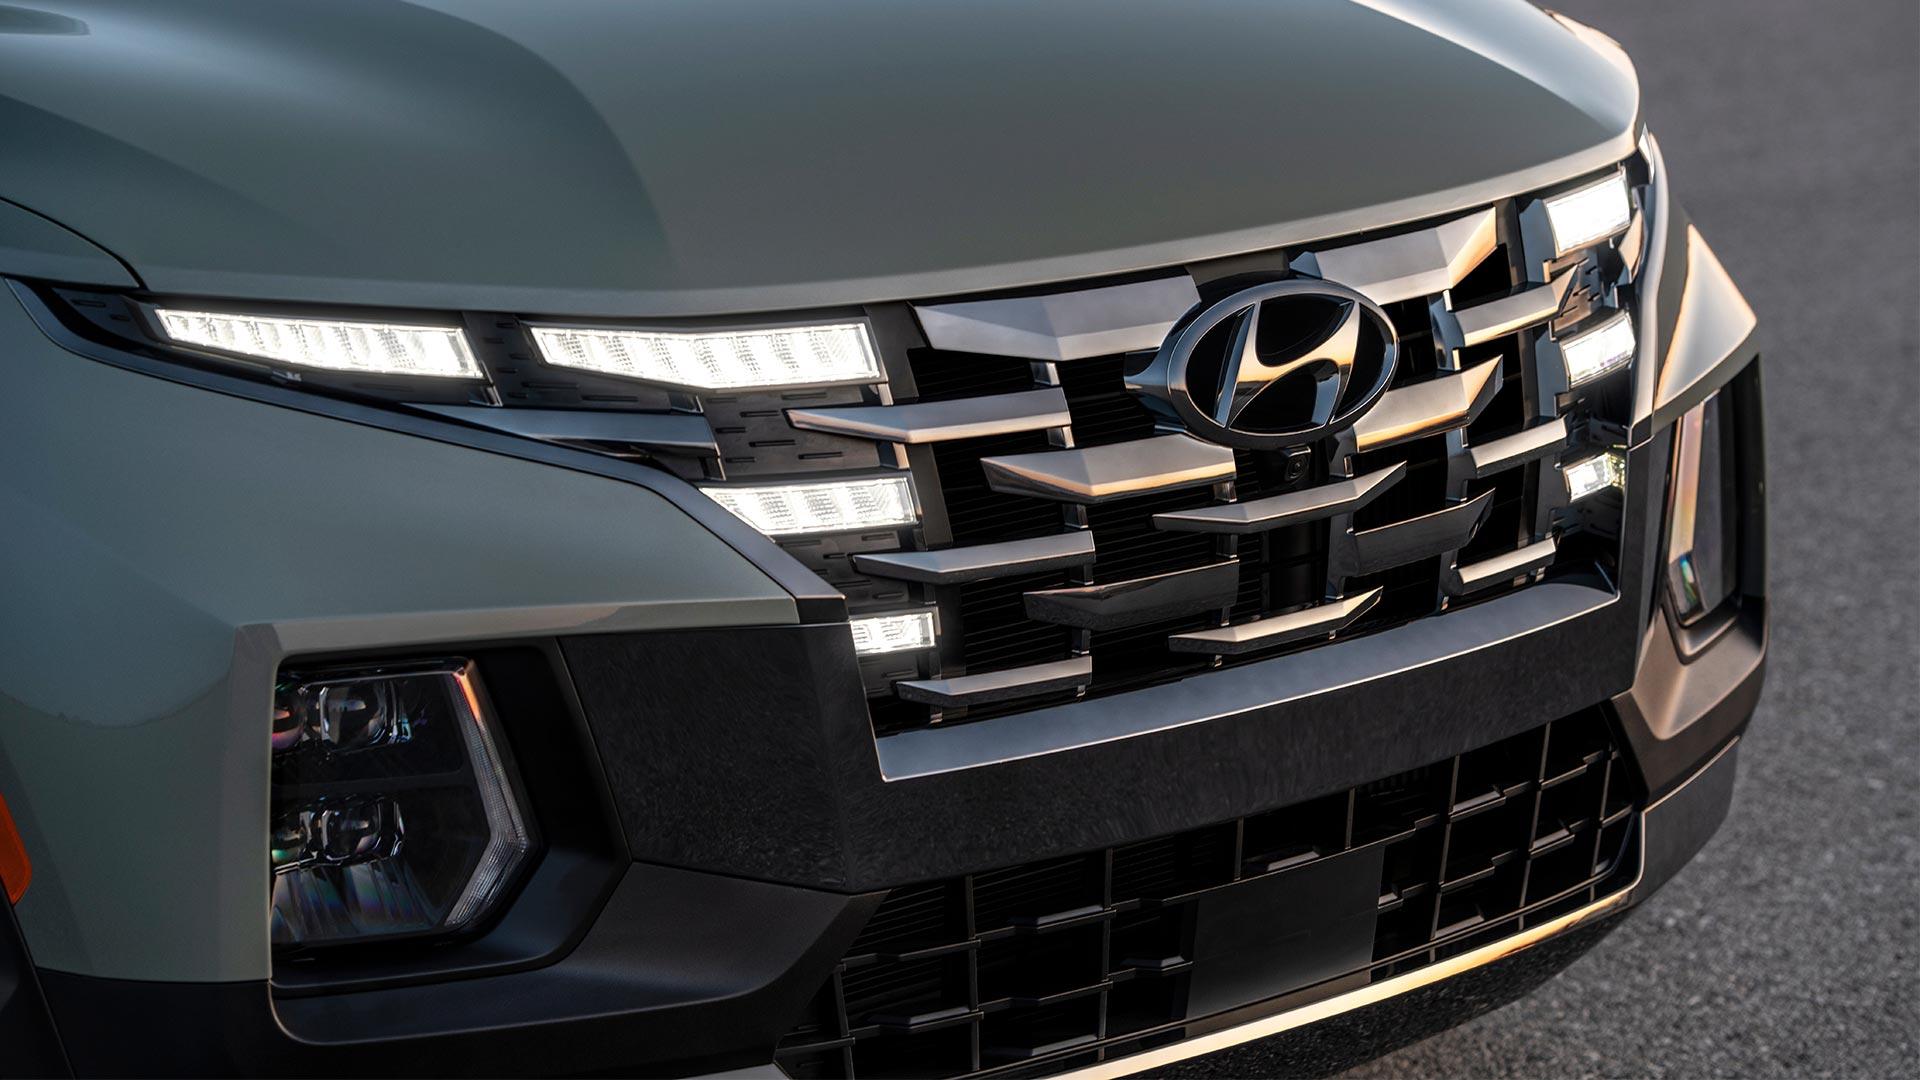 The Hyundai Santa Cruz Grille Closeup